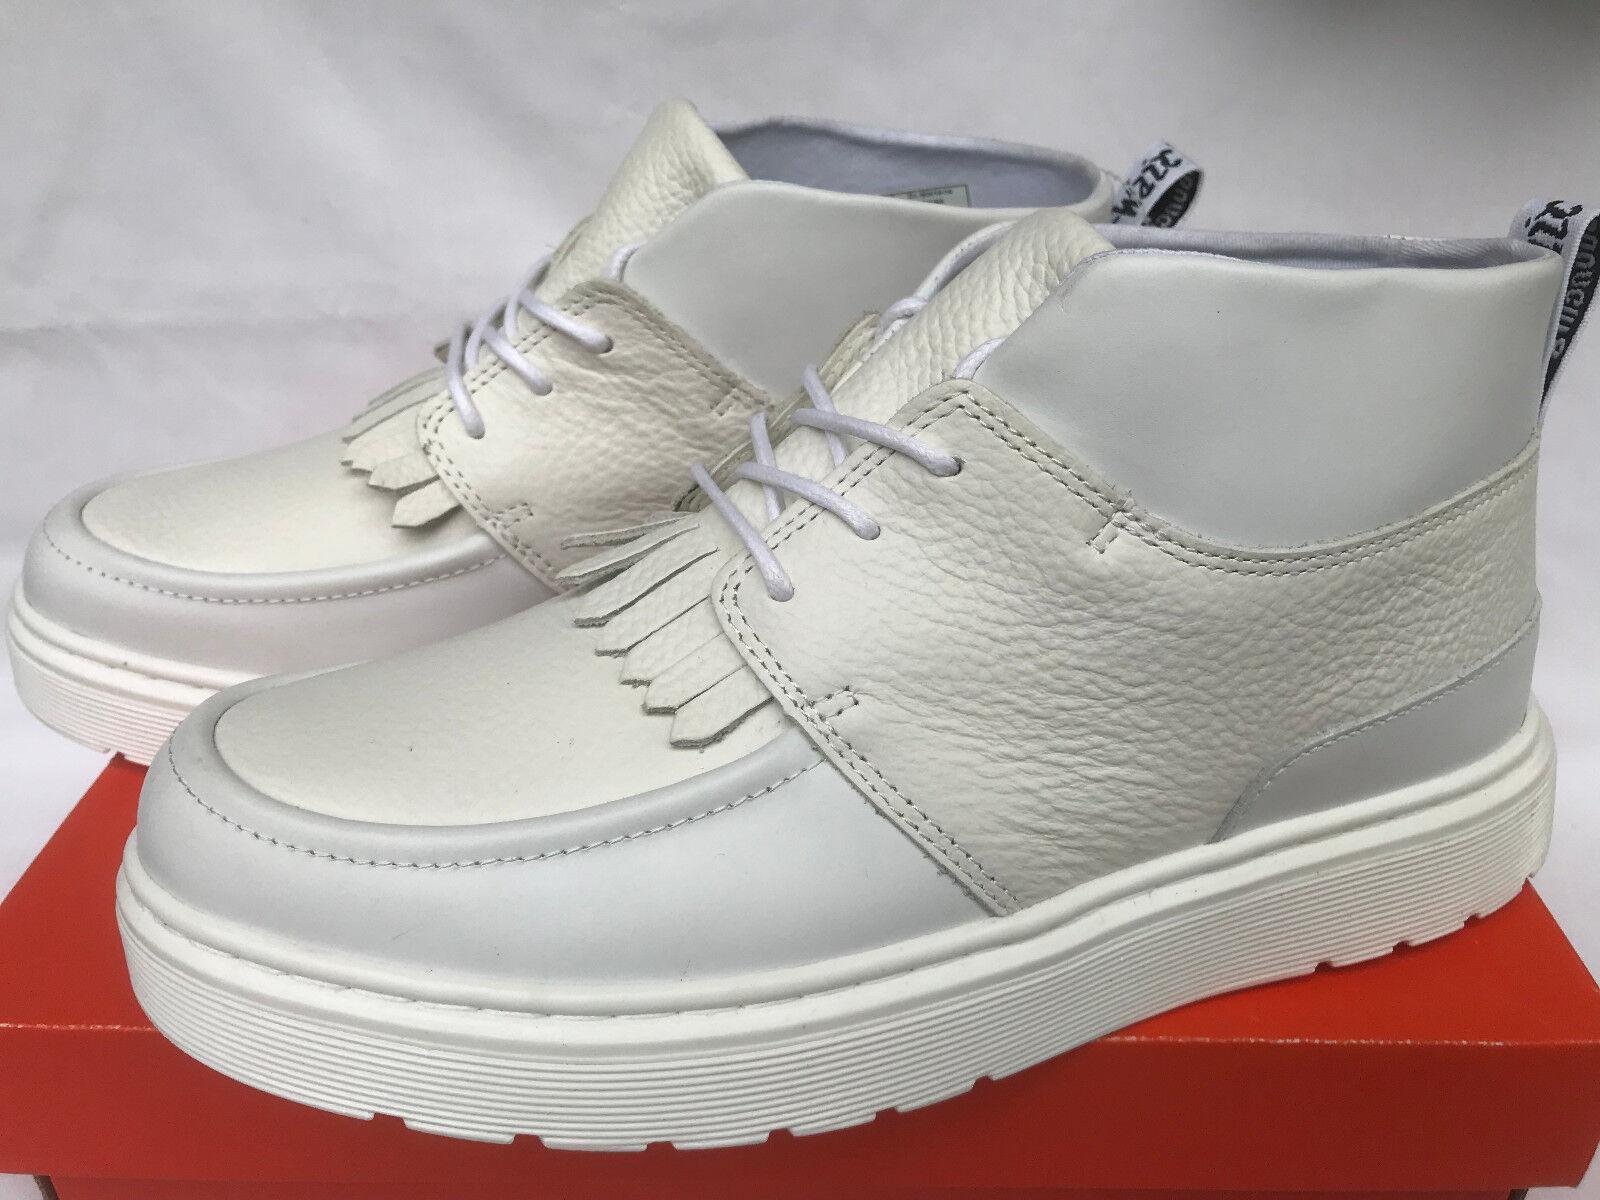 Dr. Dr. Dr. Martens Jemima flecos Chukka mediados De Cuero blancoo Moc Toe botas Zapatos para mujer 8 bbc36d